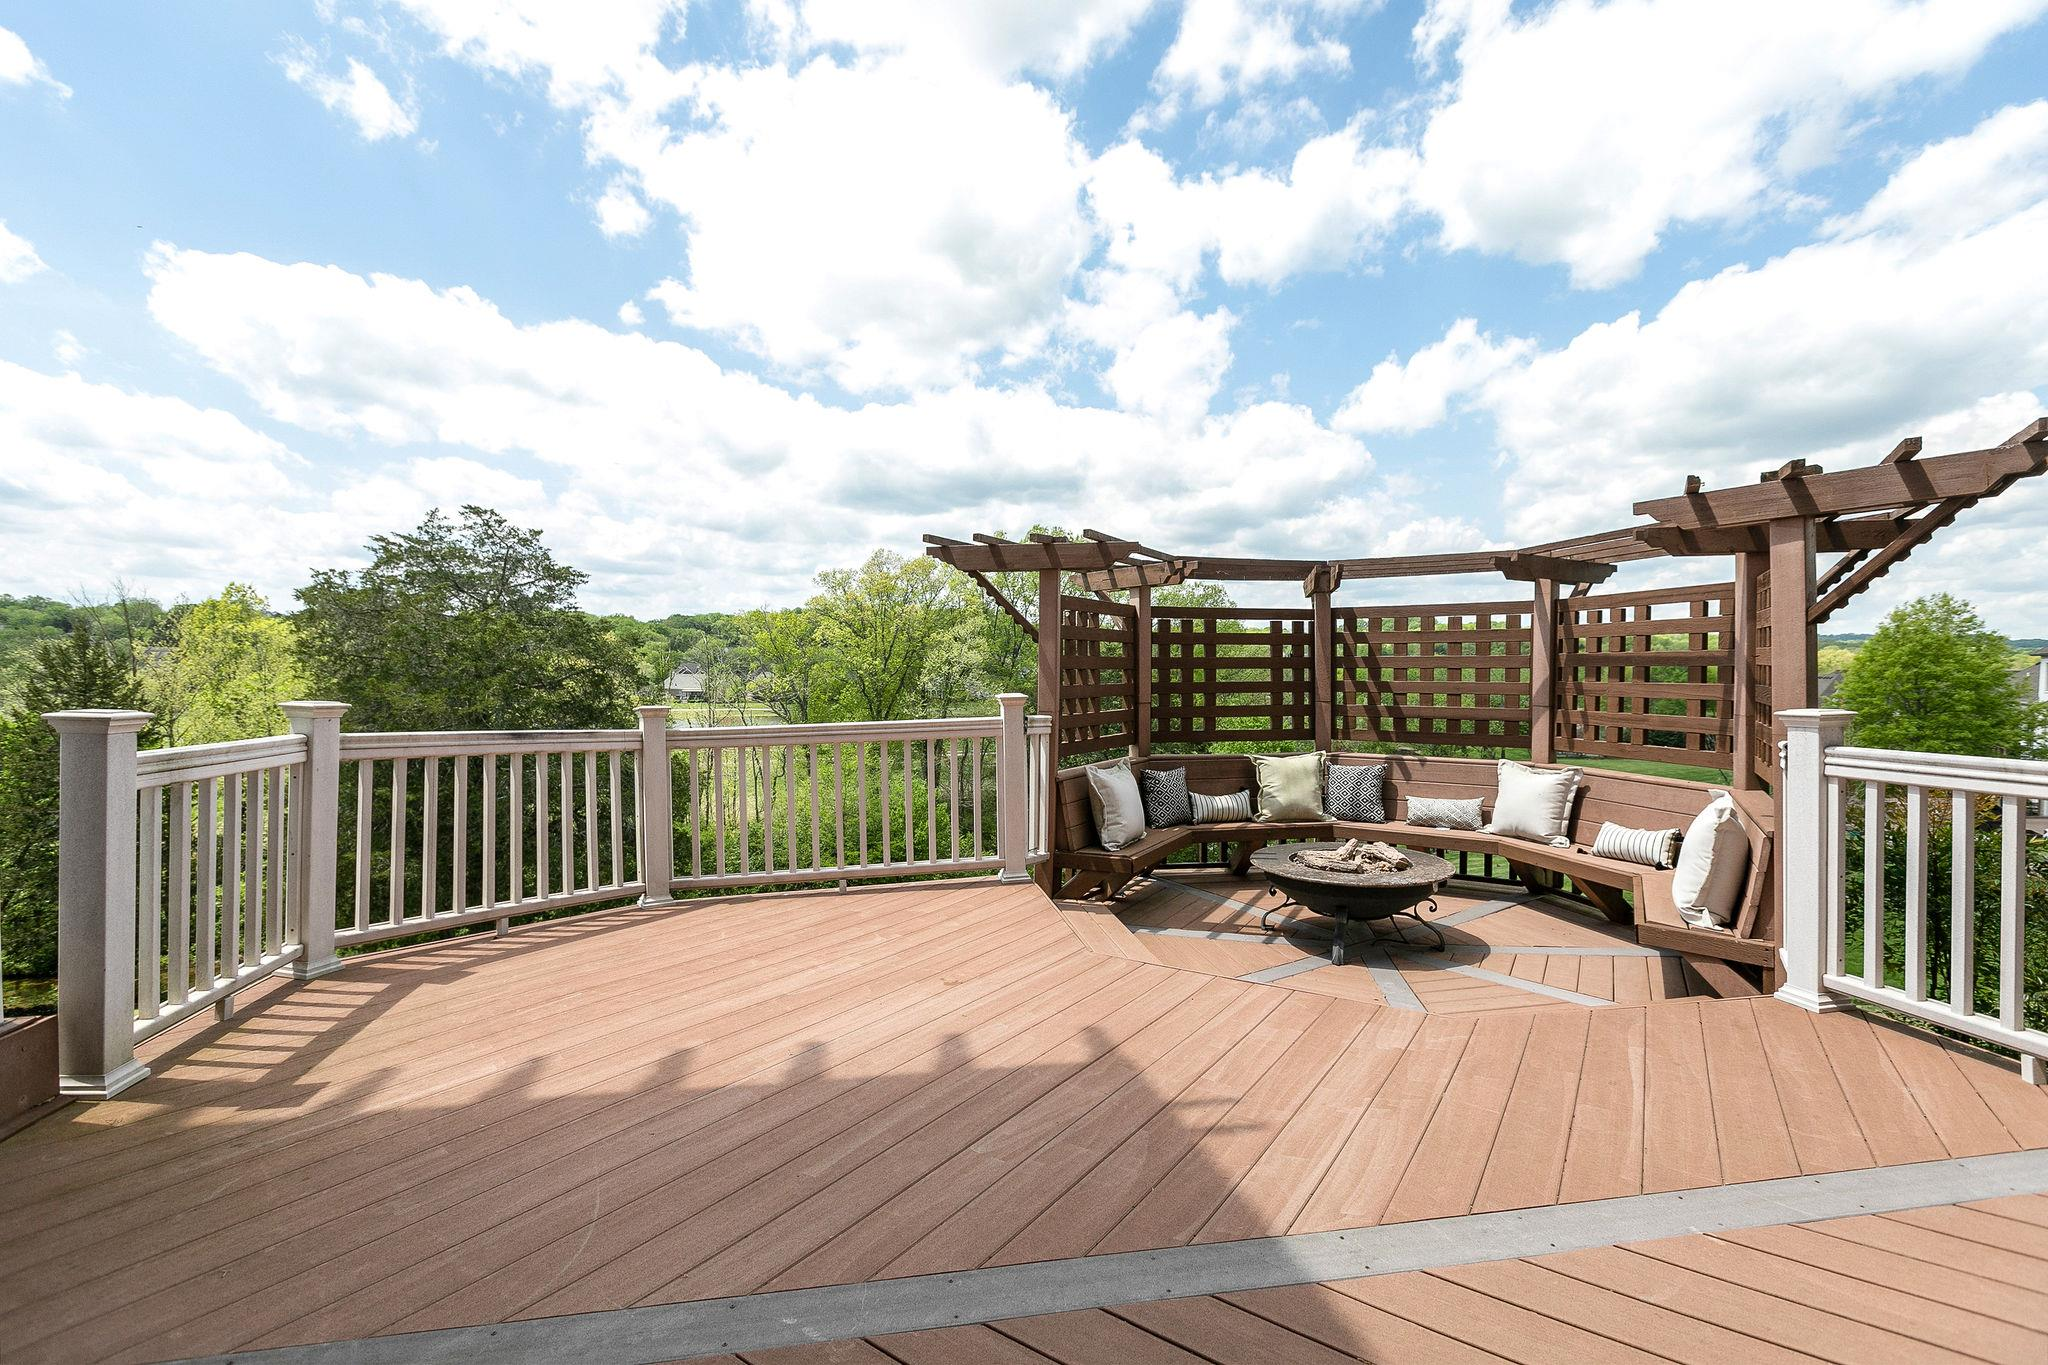 1278 Twelve Stones Xing, Goodlettsville, TN 37072 - Goodlettsville, TN real estate listing